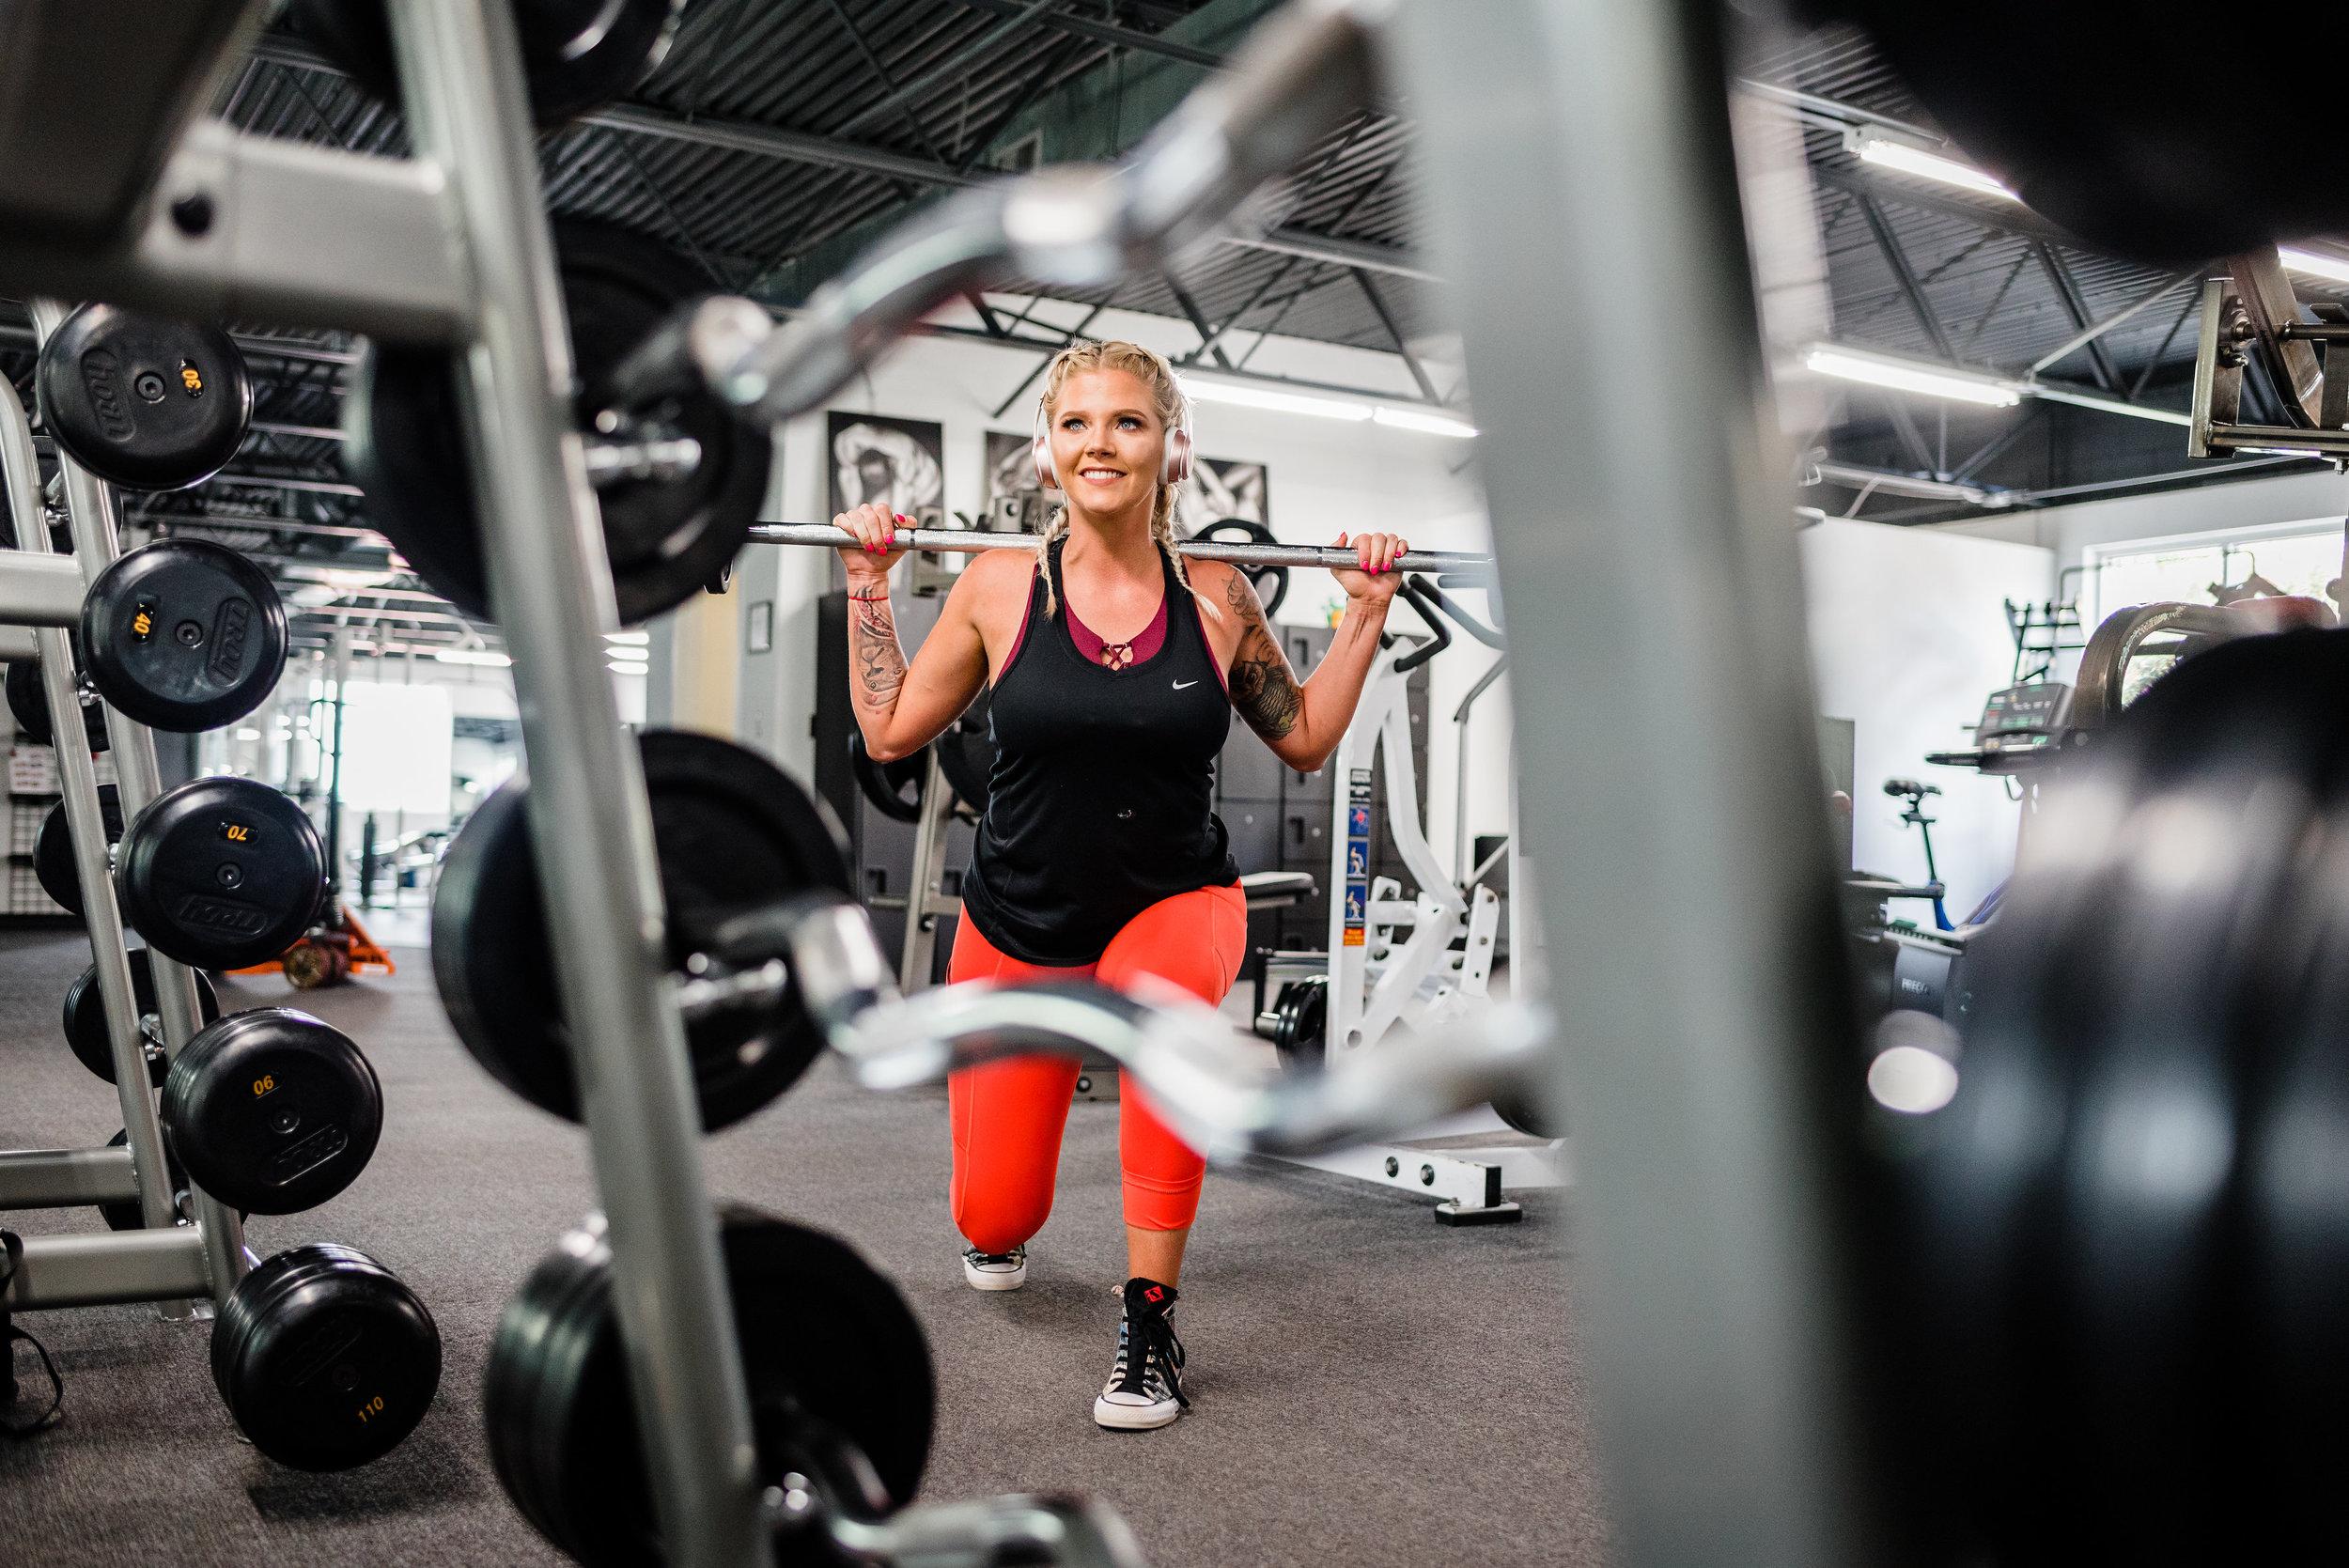 Lisa_workout-40.jpg